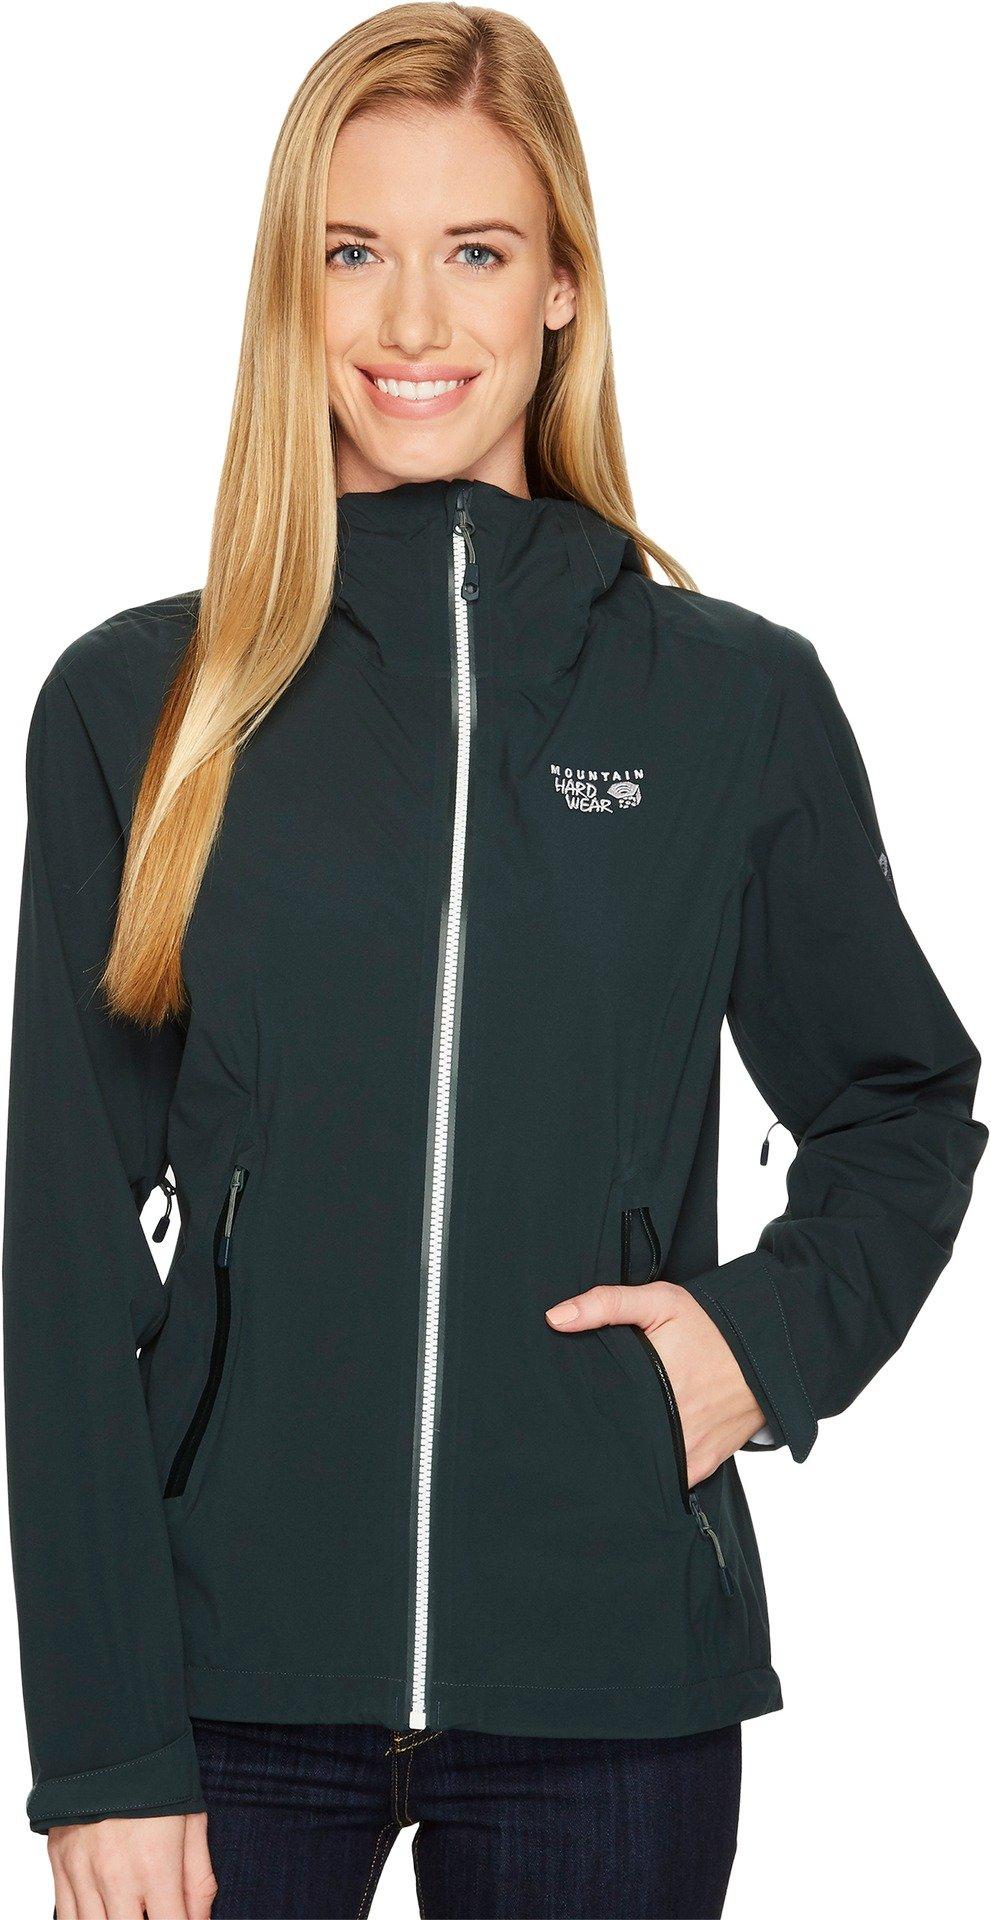 Mountain Hardwear Women's Stretch Ozonic¿ Jacket Blue Spruce Jacket by Mountain Hardwear